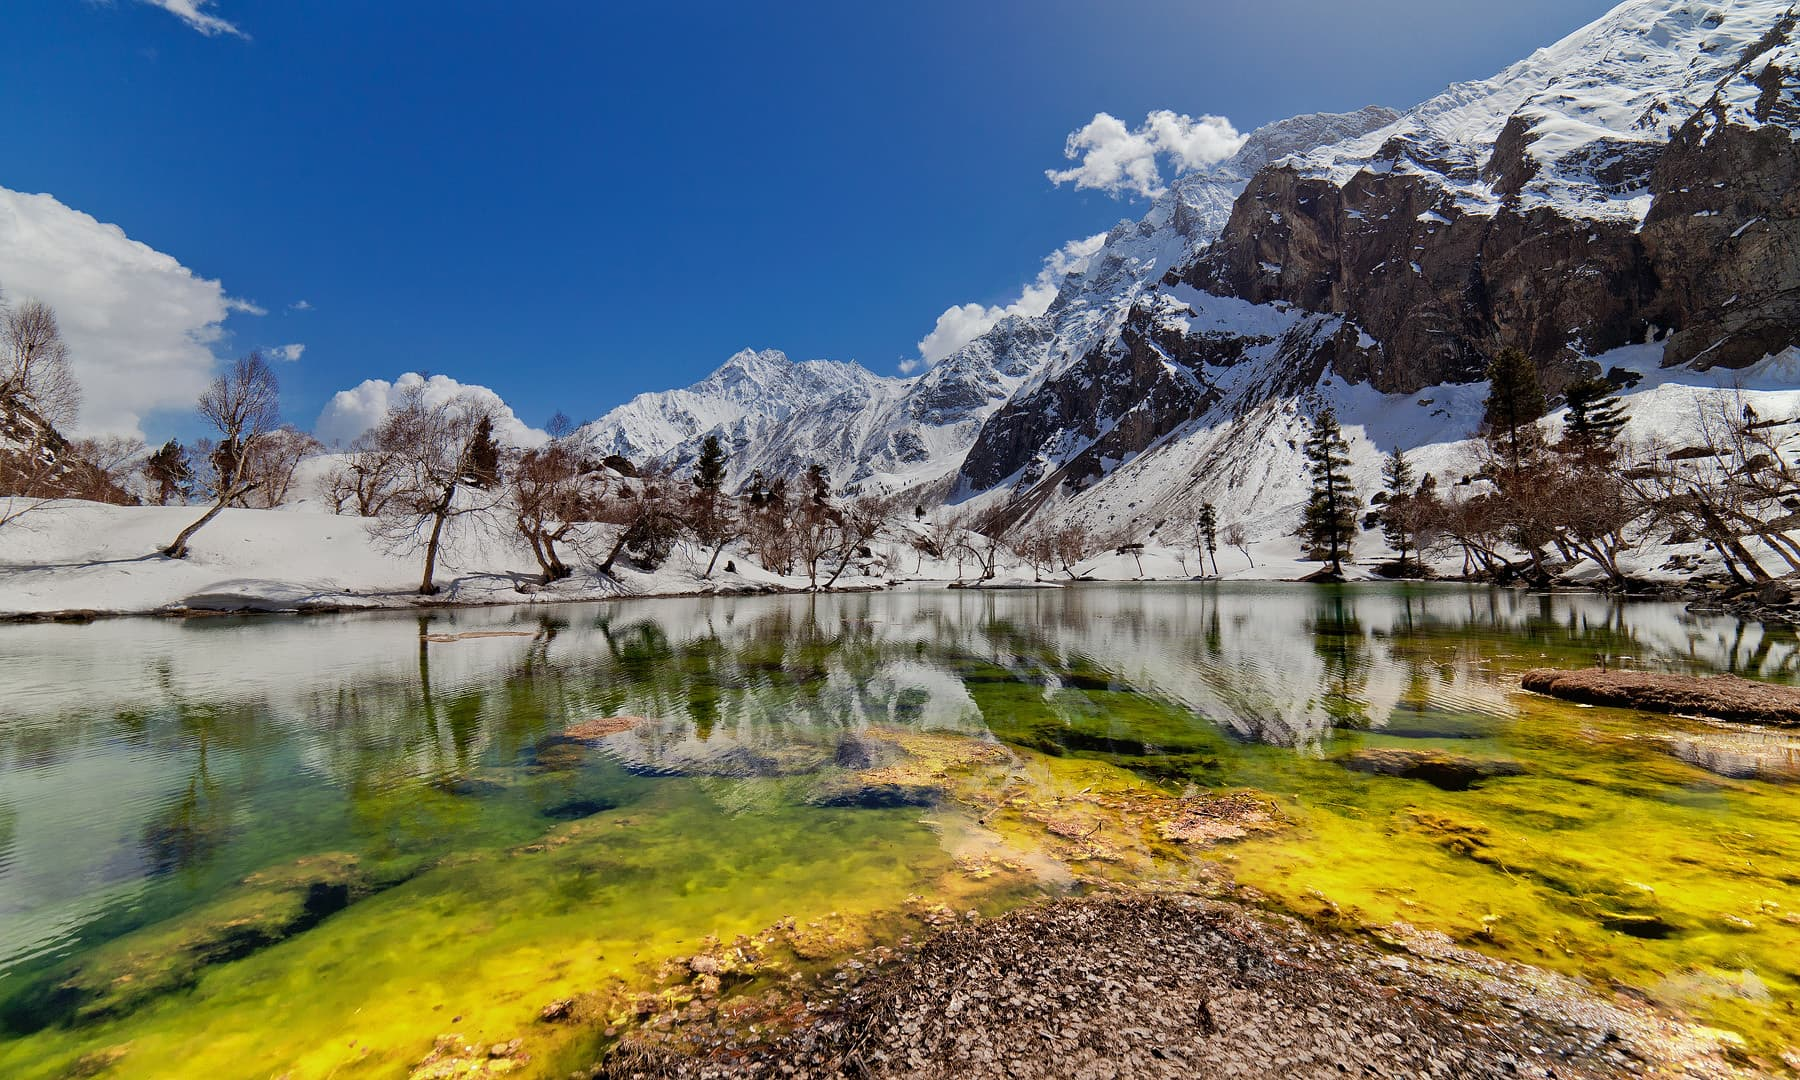 Naltar lake. — Syed Mehdi Bukhari